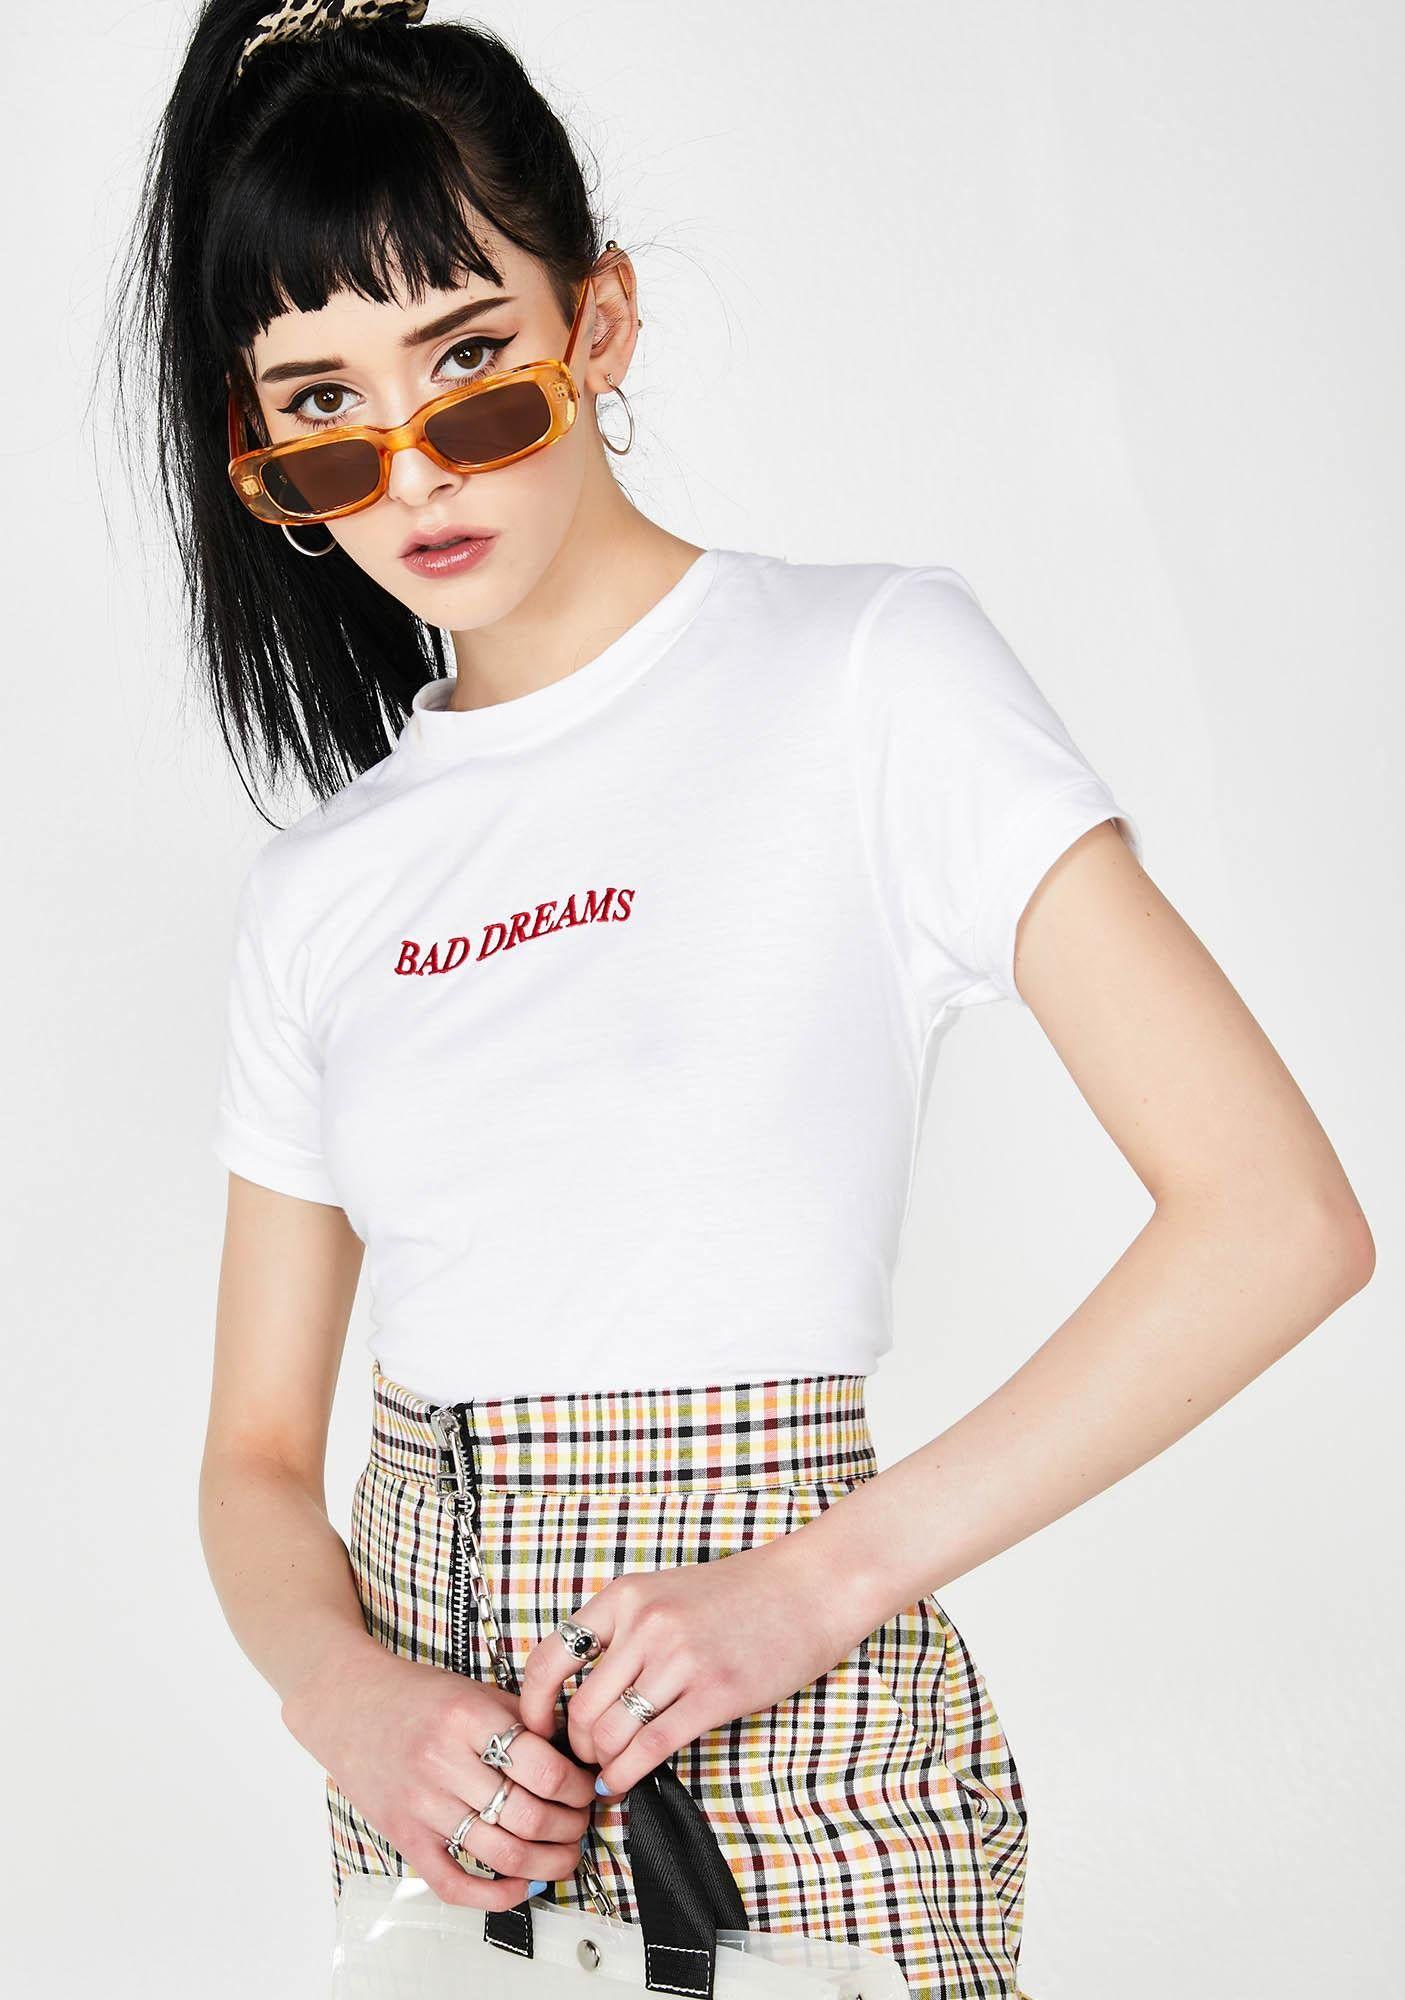 0025384e7d09 Dreams Tee in 2019 | FaShIoN | Fashion, T shirts for women, Ragged ...